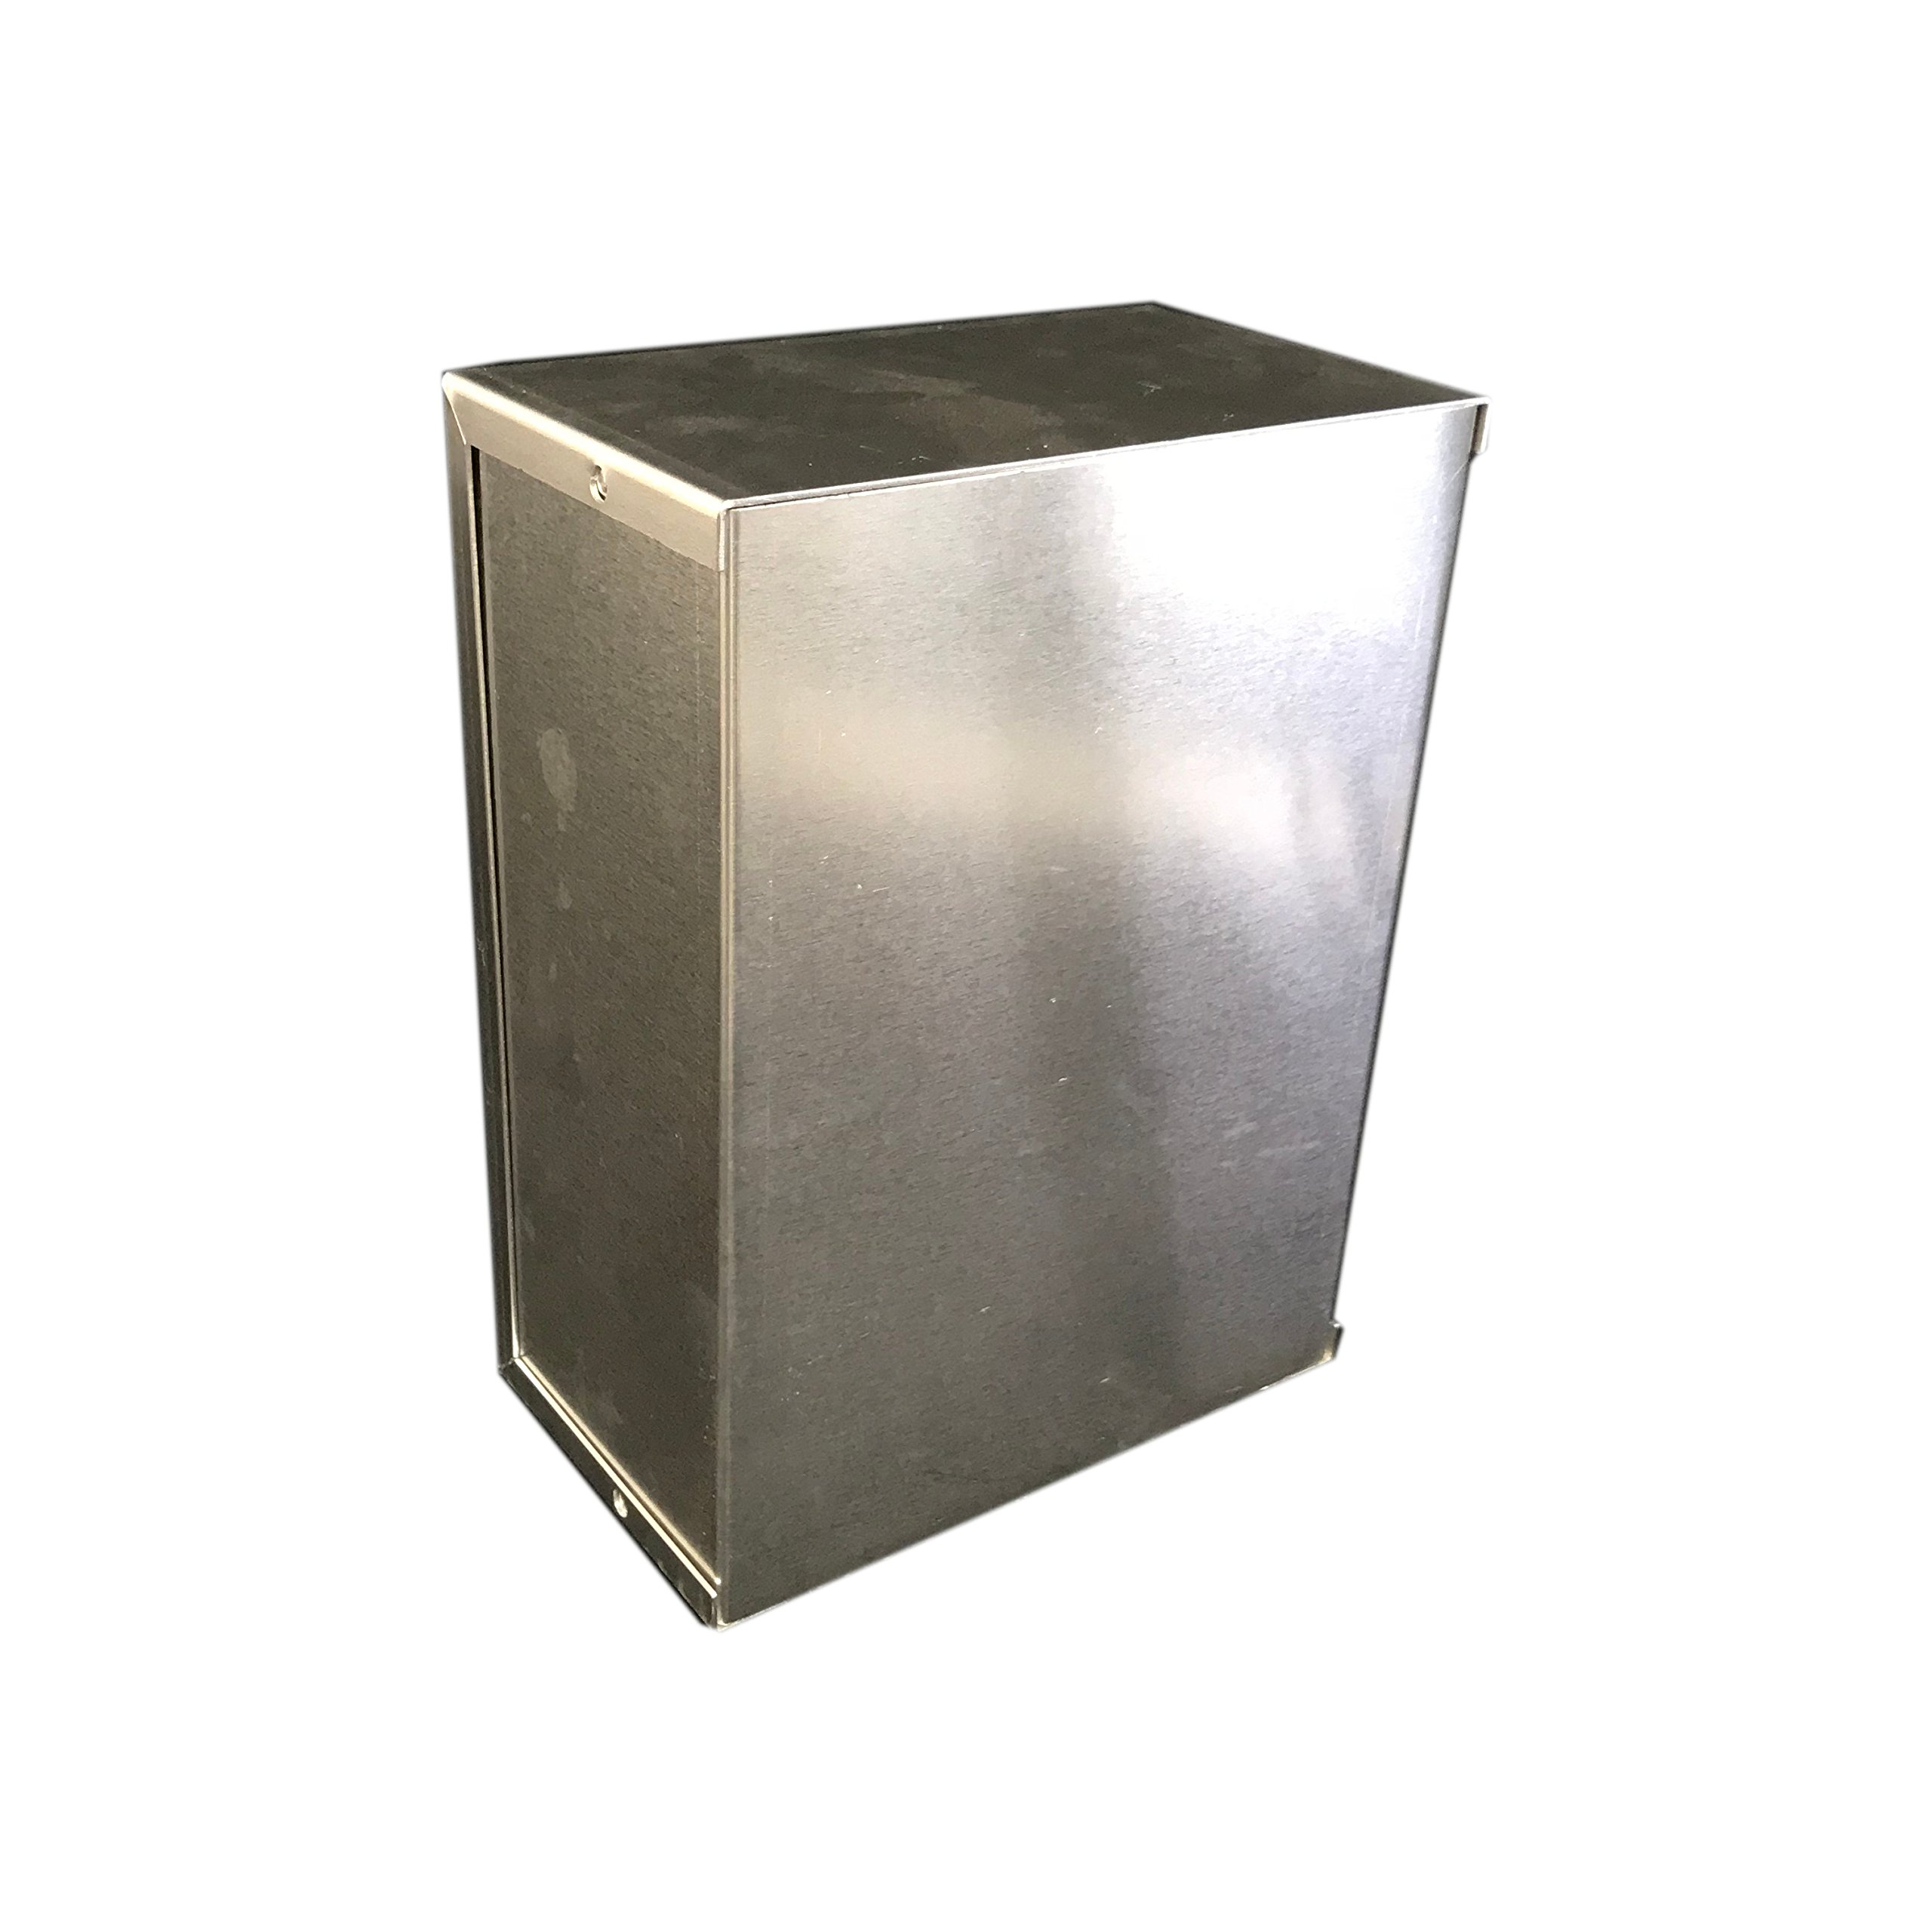 BUD Industries CU-3009-A Aluminum Electronics Minibox, 8'' Length x 6'' Width x 3-1/2'' Height, Natural Finish